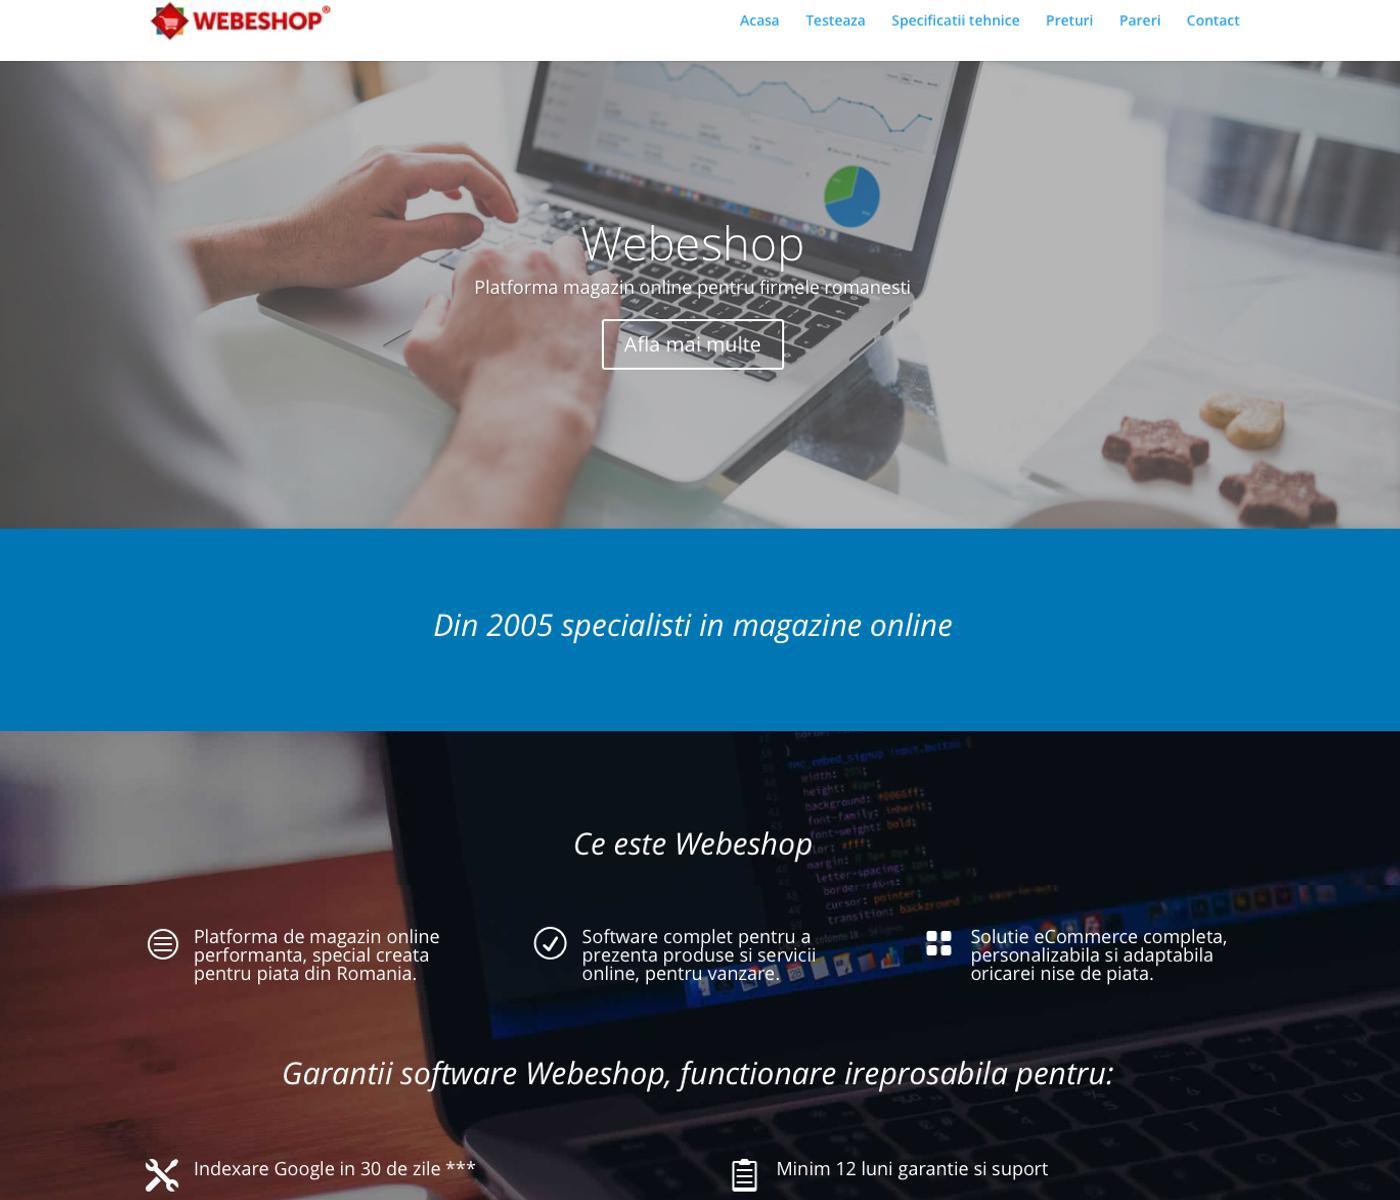 Site de prezentare si demo al platformei Webeshop.